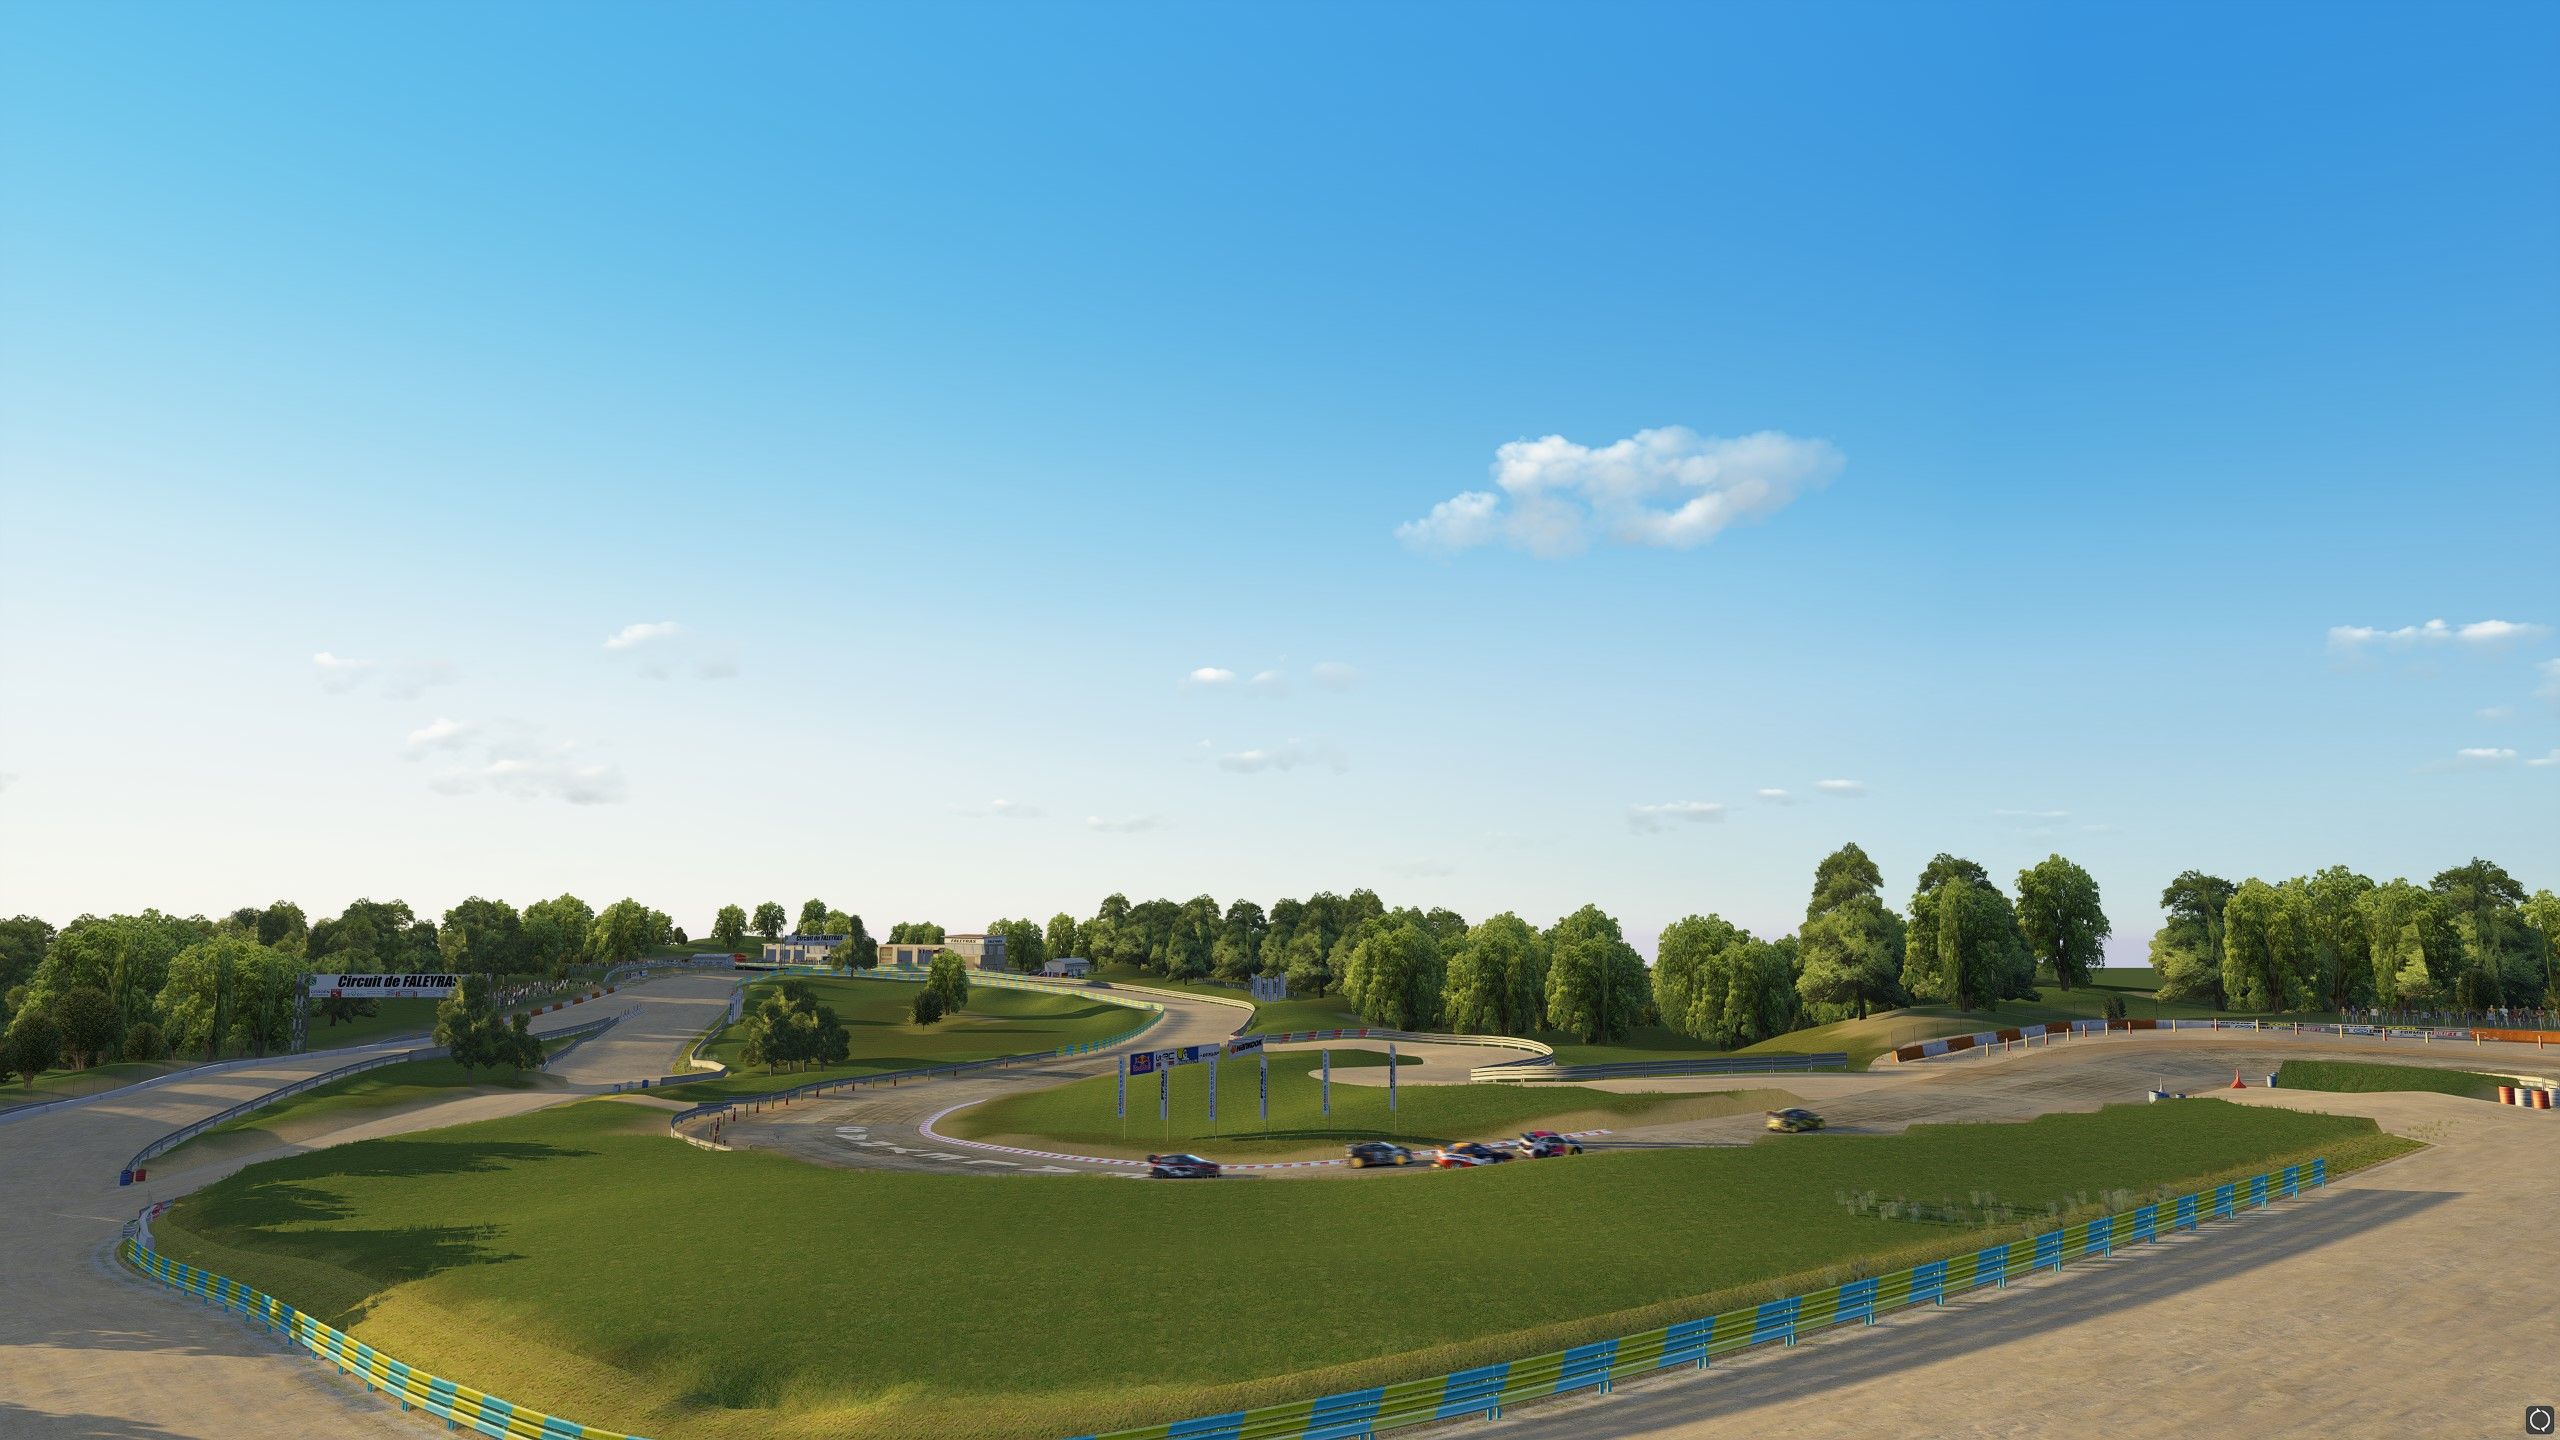 Screenshot_rallycross_renault_clio_faleyras_track_25-10-120-19-53-26.jpg